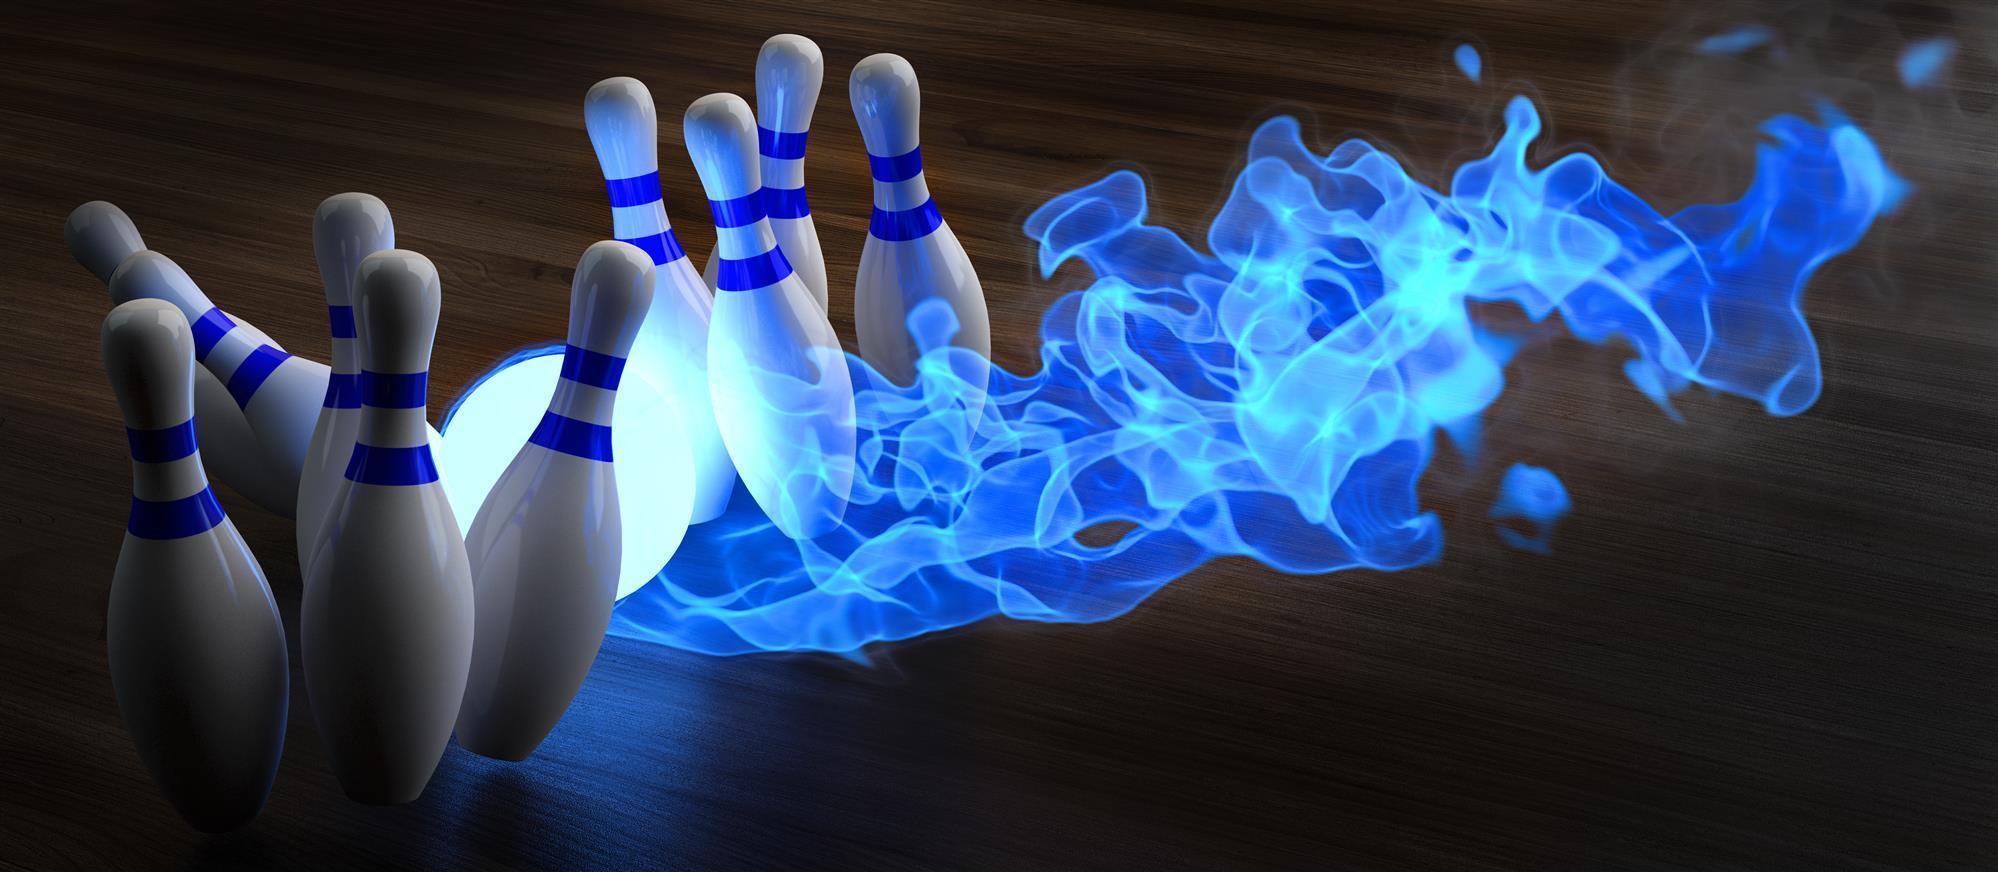 bowling alley season and championships